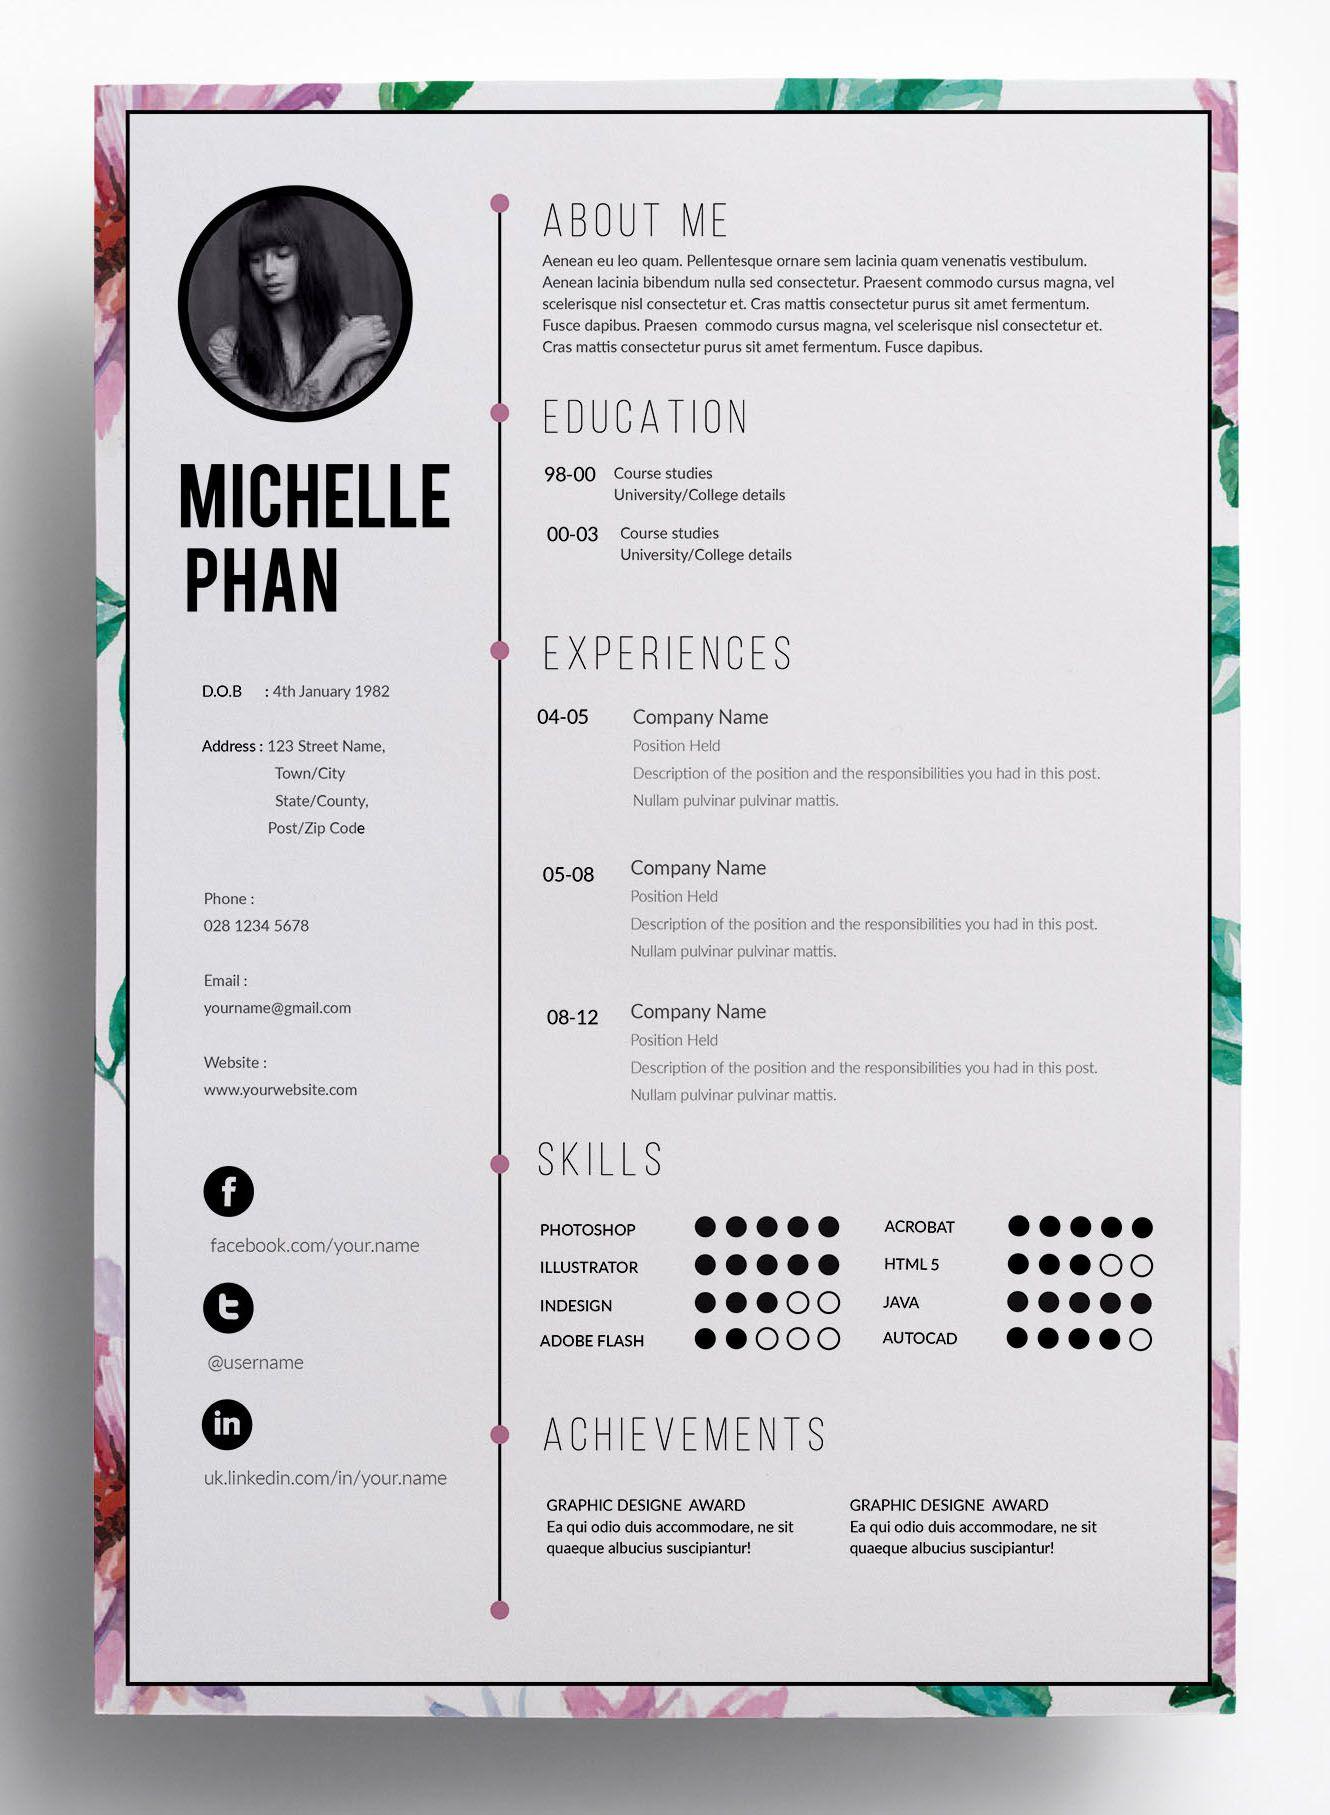 Floral Cv Template Moderner Lebenslauf Lebenslauf Lebenslauf Design